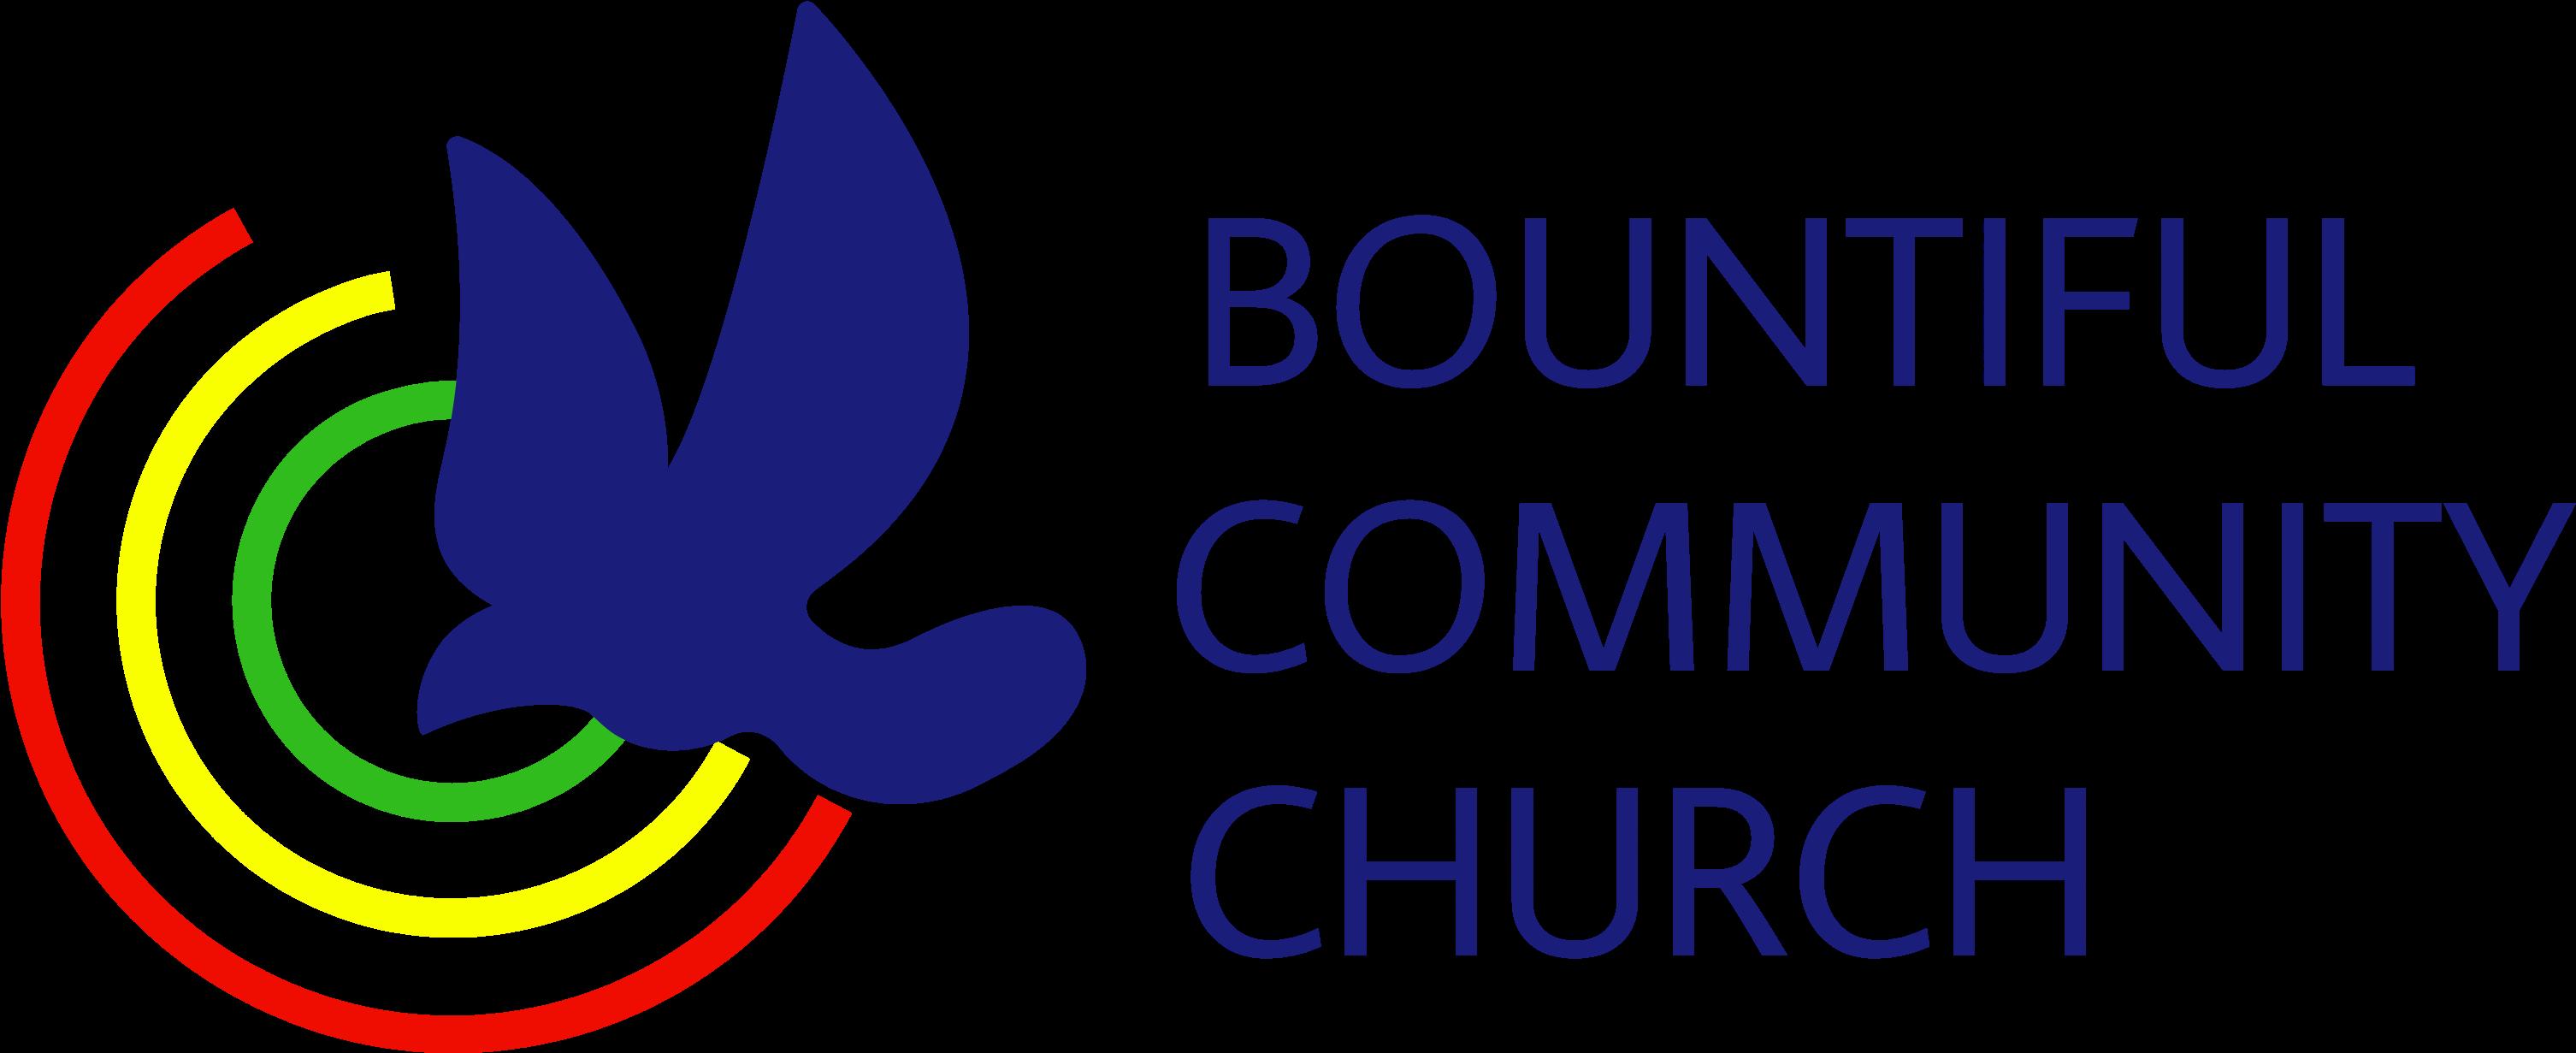 Christian Church Bulletin Clip Art.